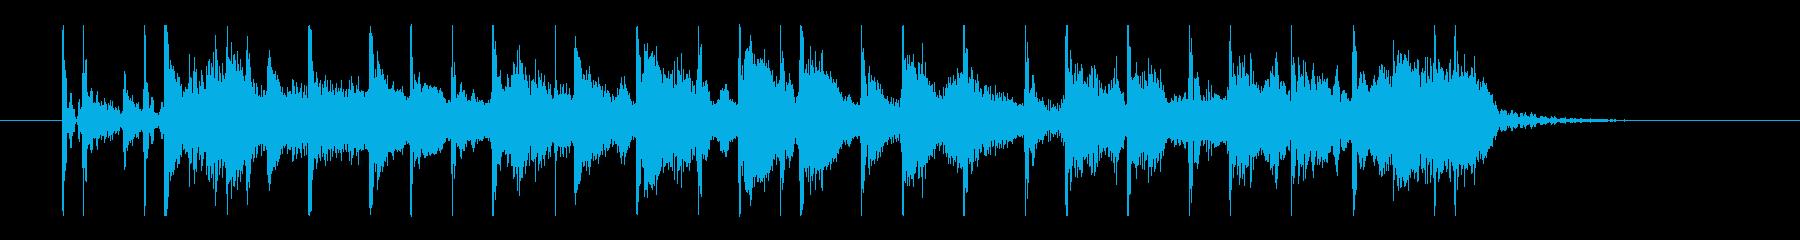 80's ニューウェイブ風シンセサウンドの再生済みの波形